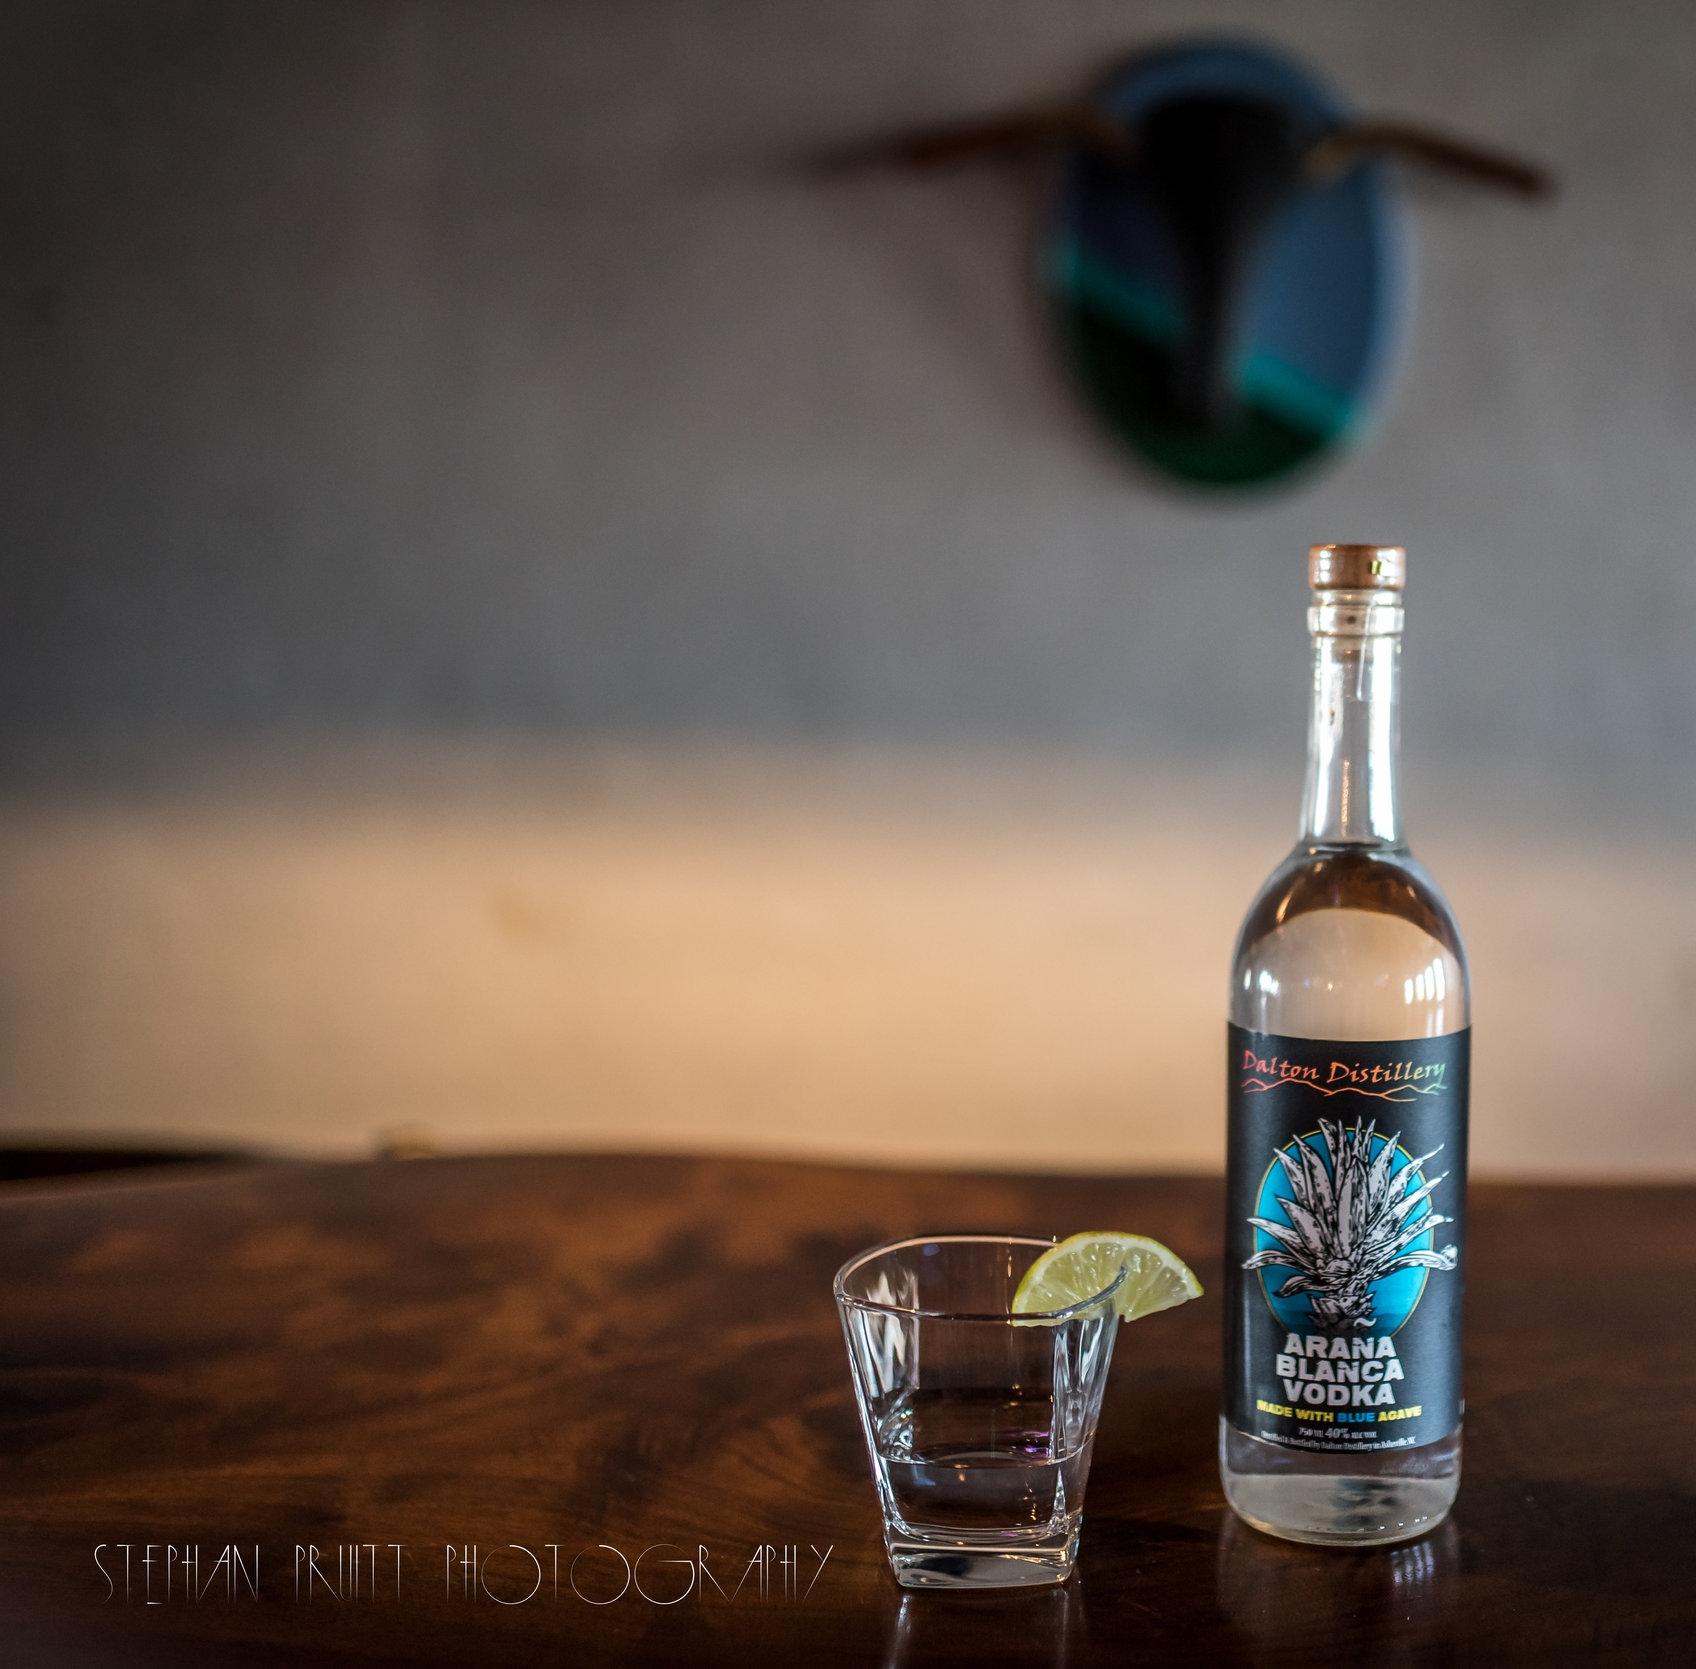 Araña Blanca Vodka